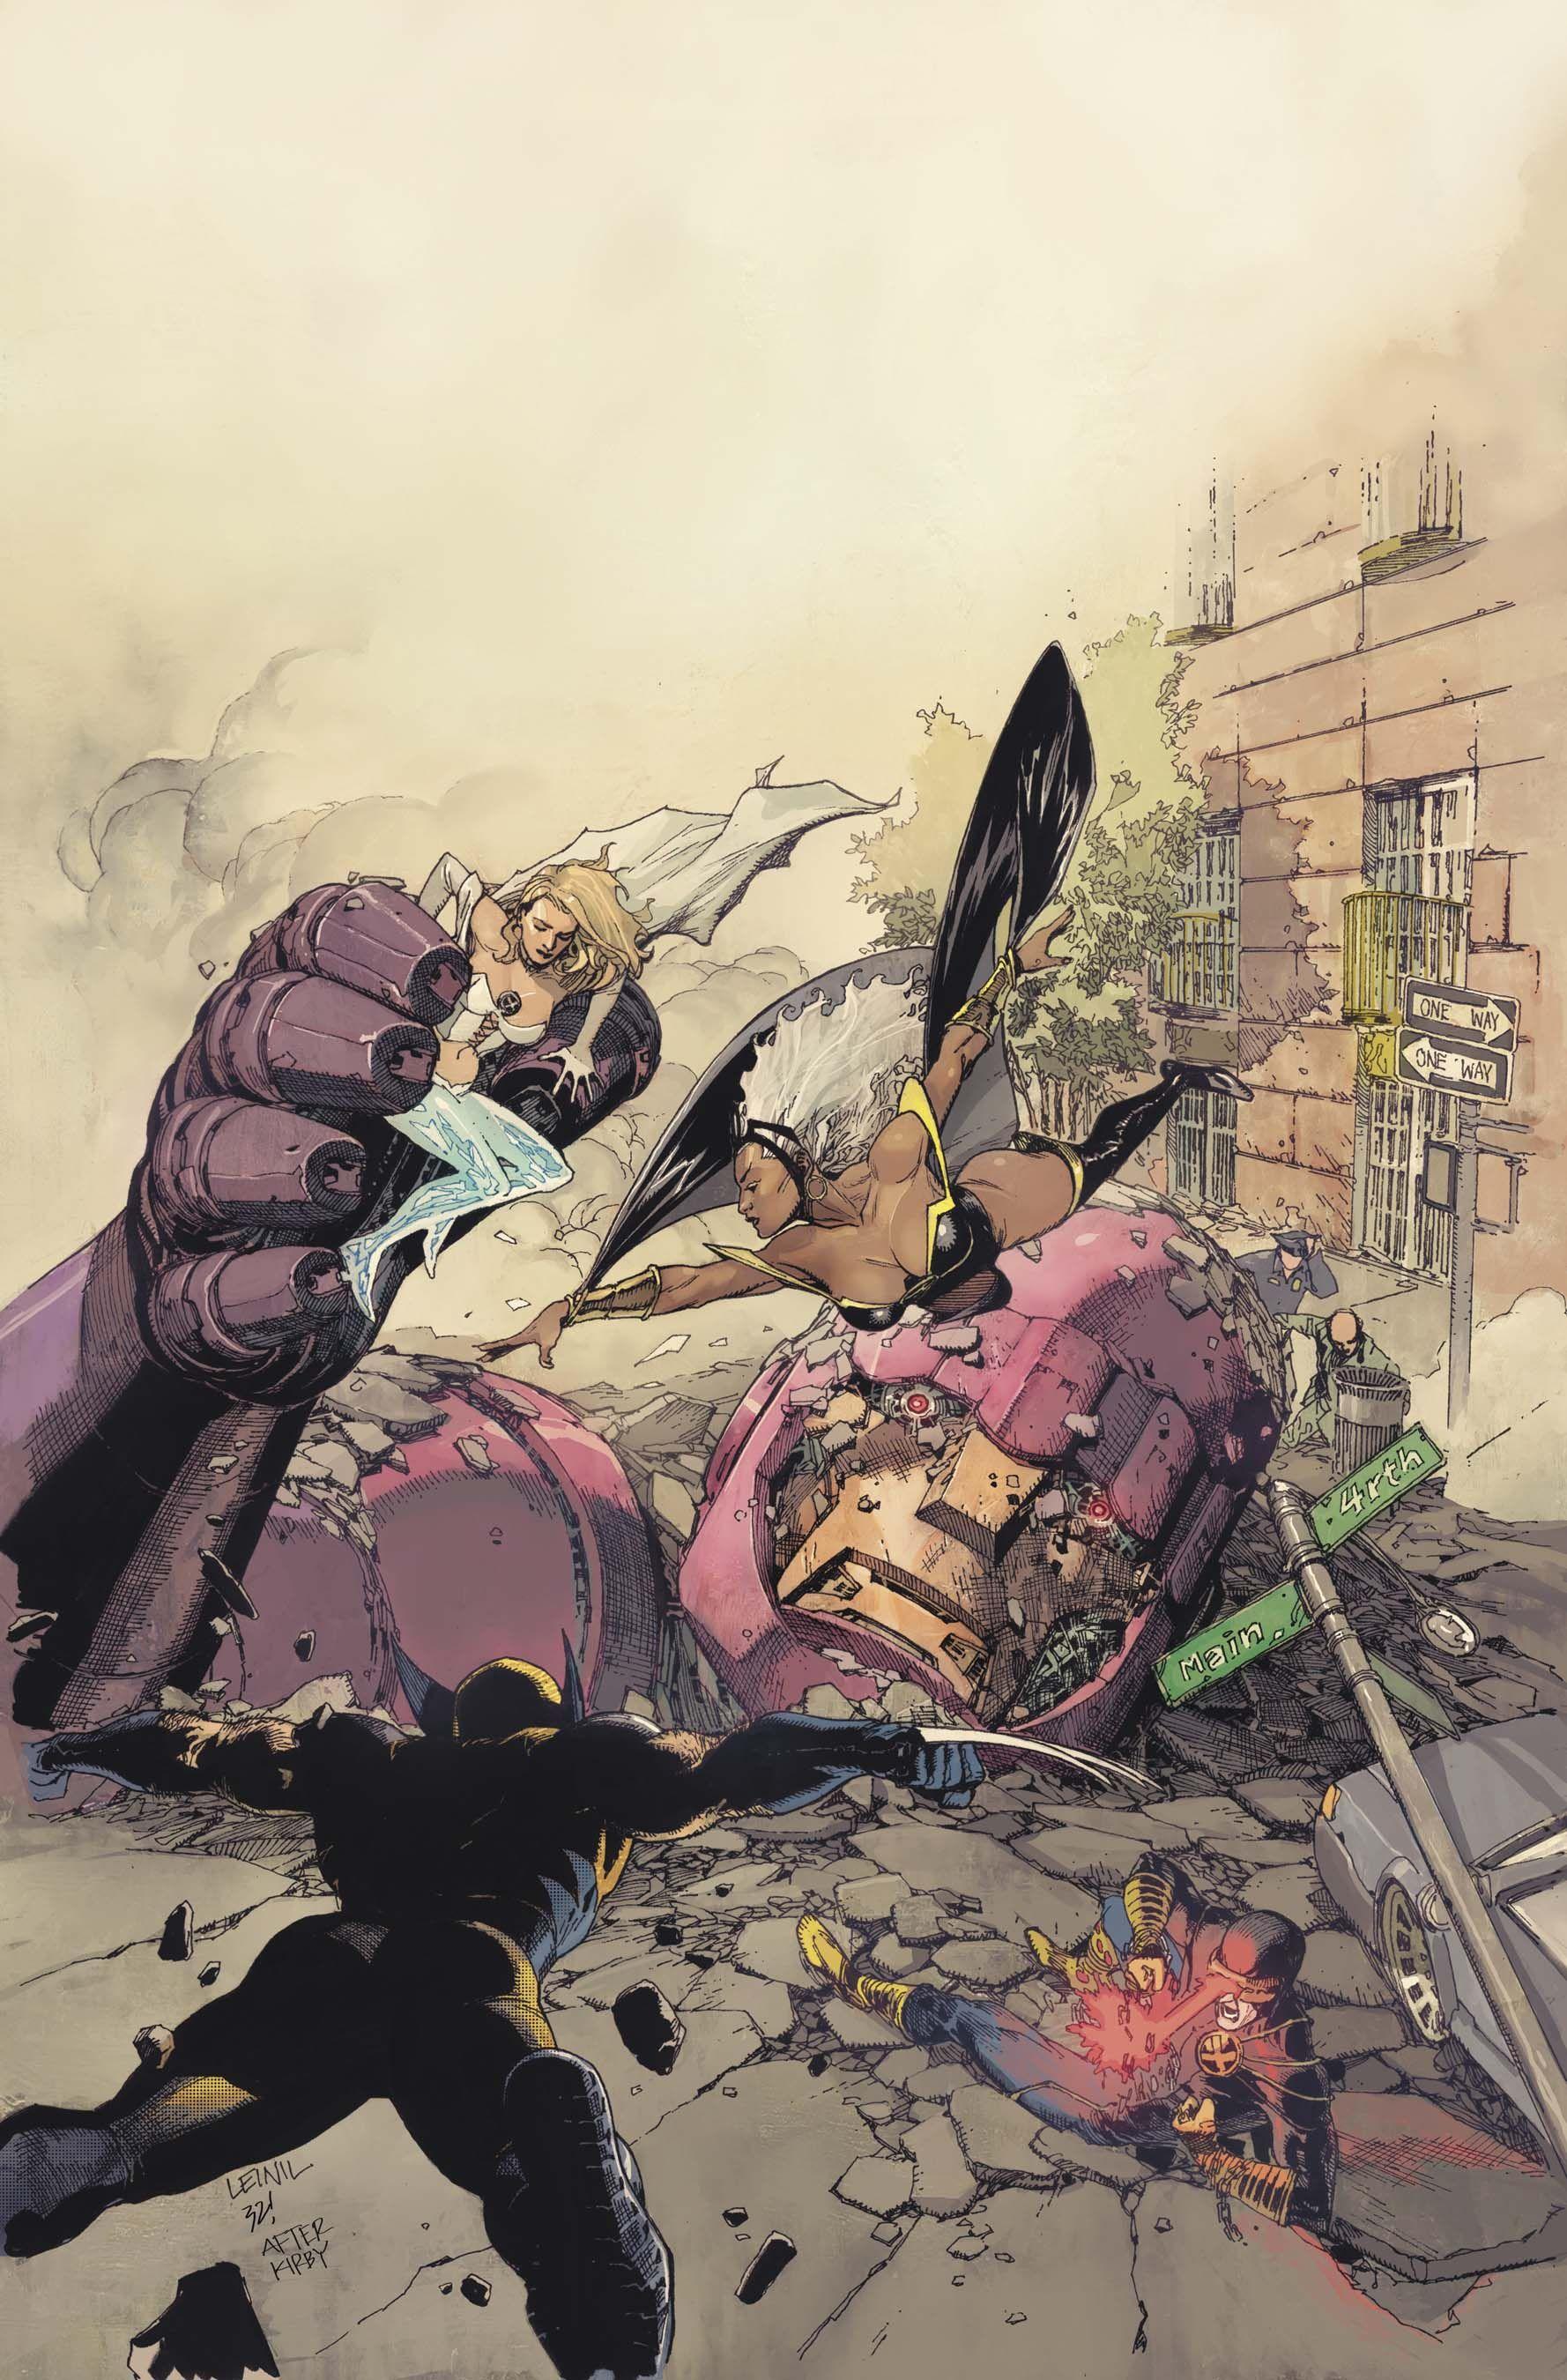 X-Men Vs Sentinel by Leinil Francis Yu (after Jack Kirby)